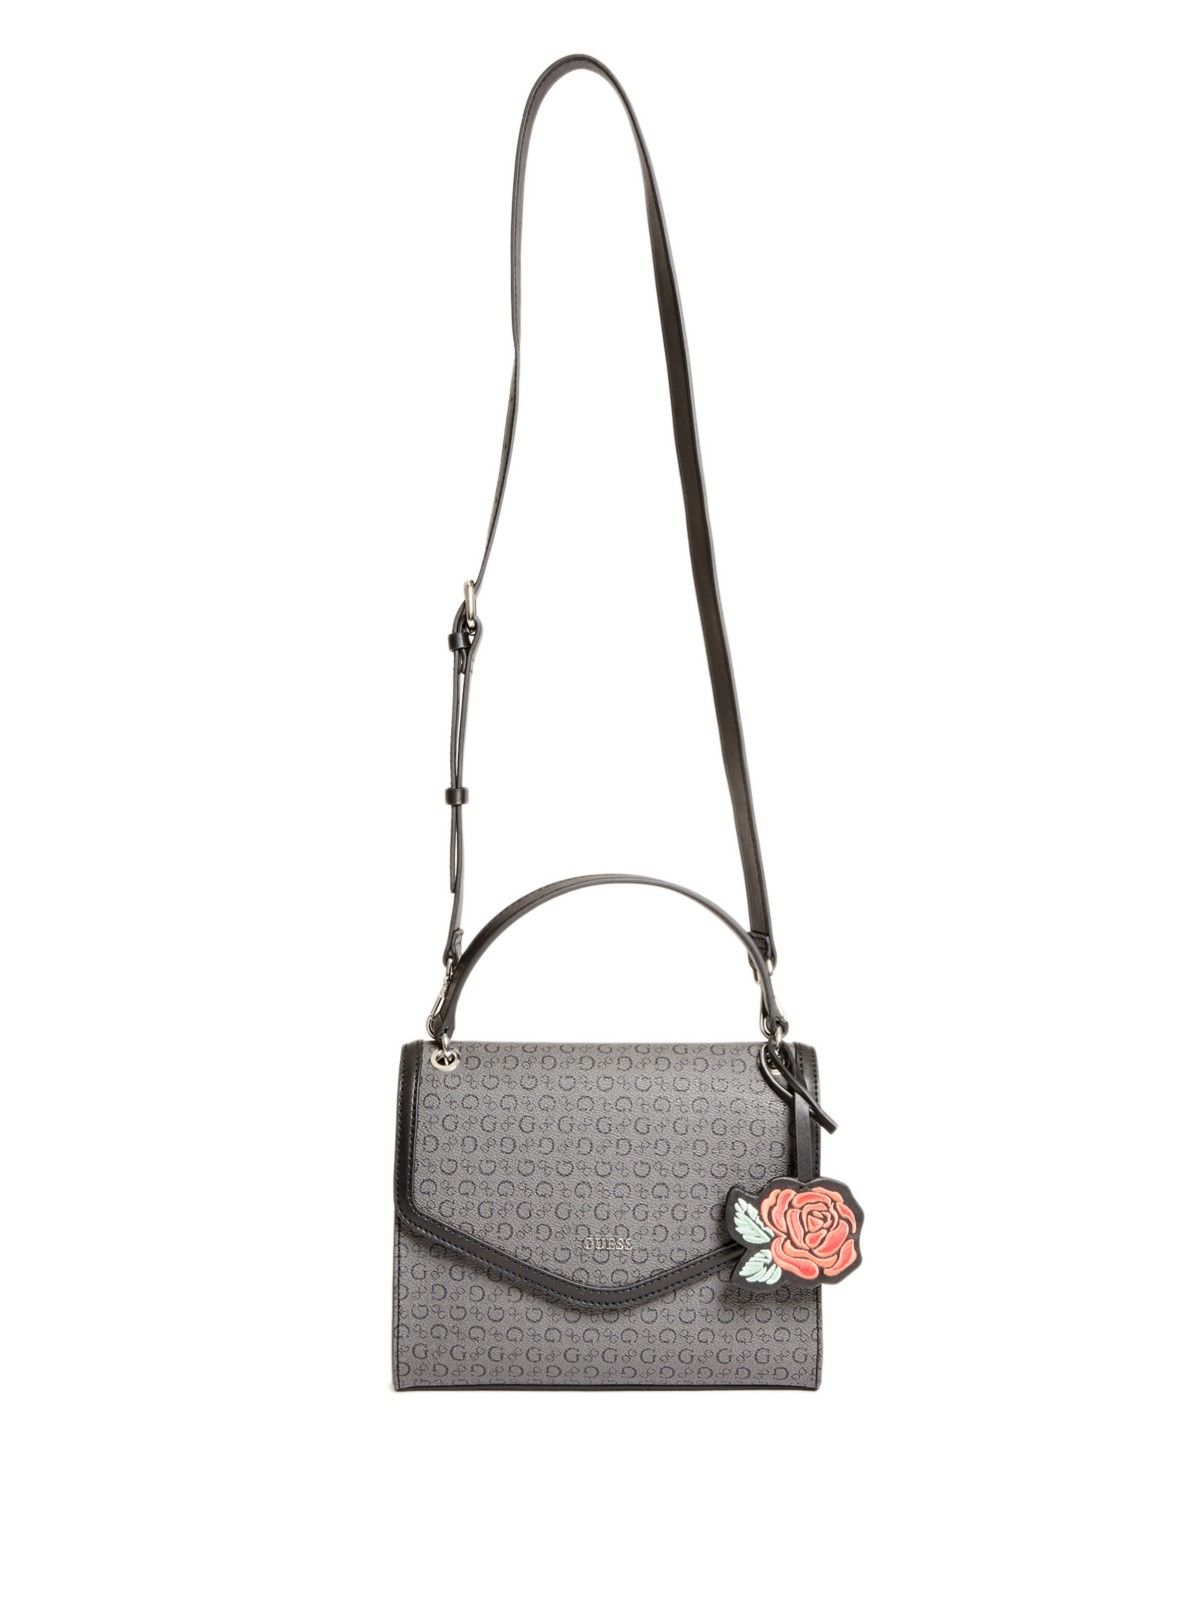 406aad9cbd05 Details about GUESS Factory Women's Rosario Logo Satchel   26. bags ...